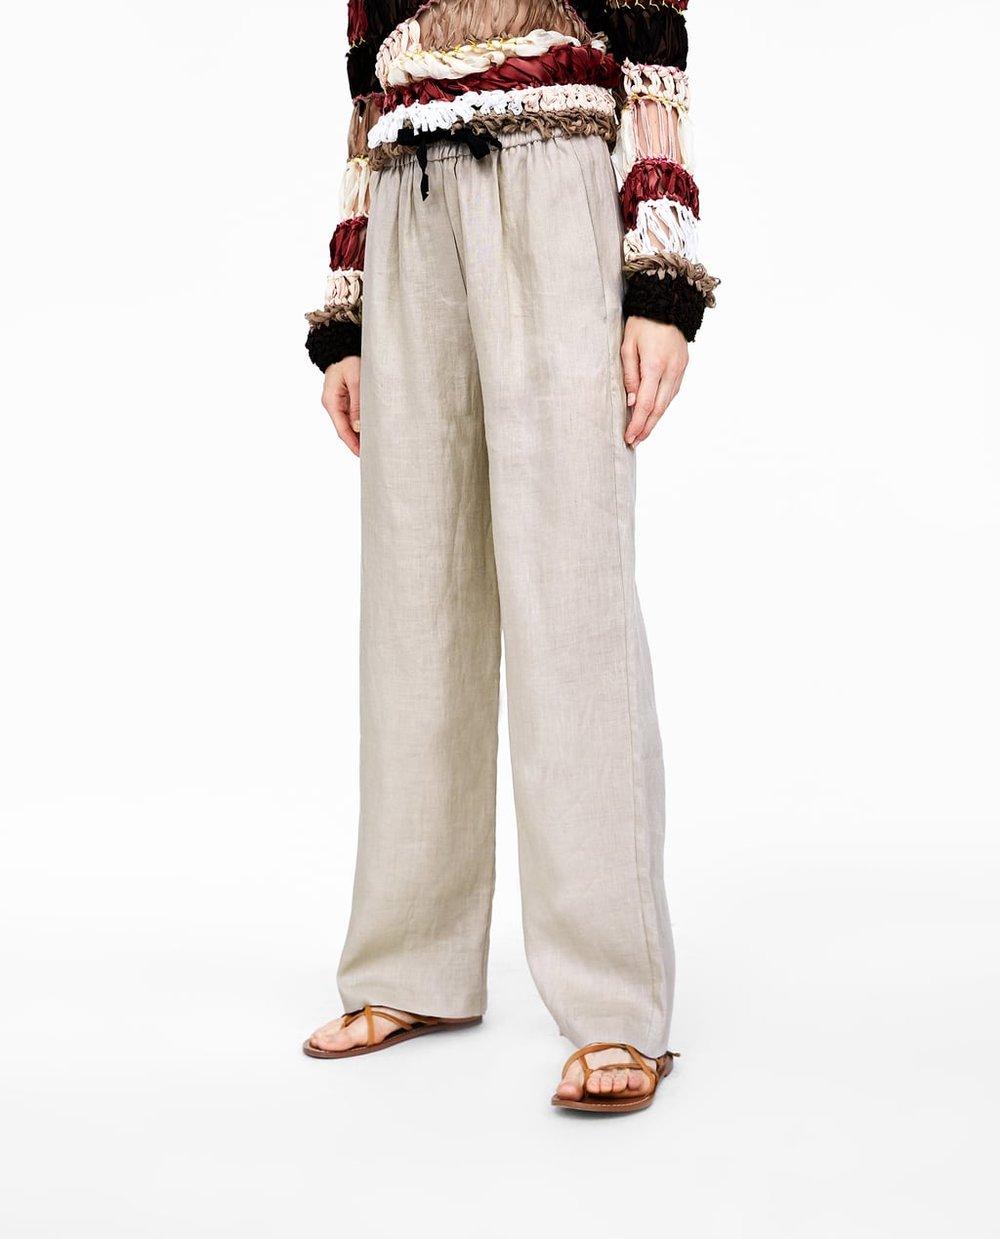 https://www.zara.com/ca/en/linen-pants-with-tie-belt-p07149081.html?v1=6008030&v2=968952